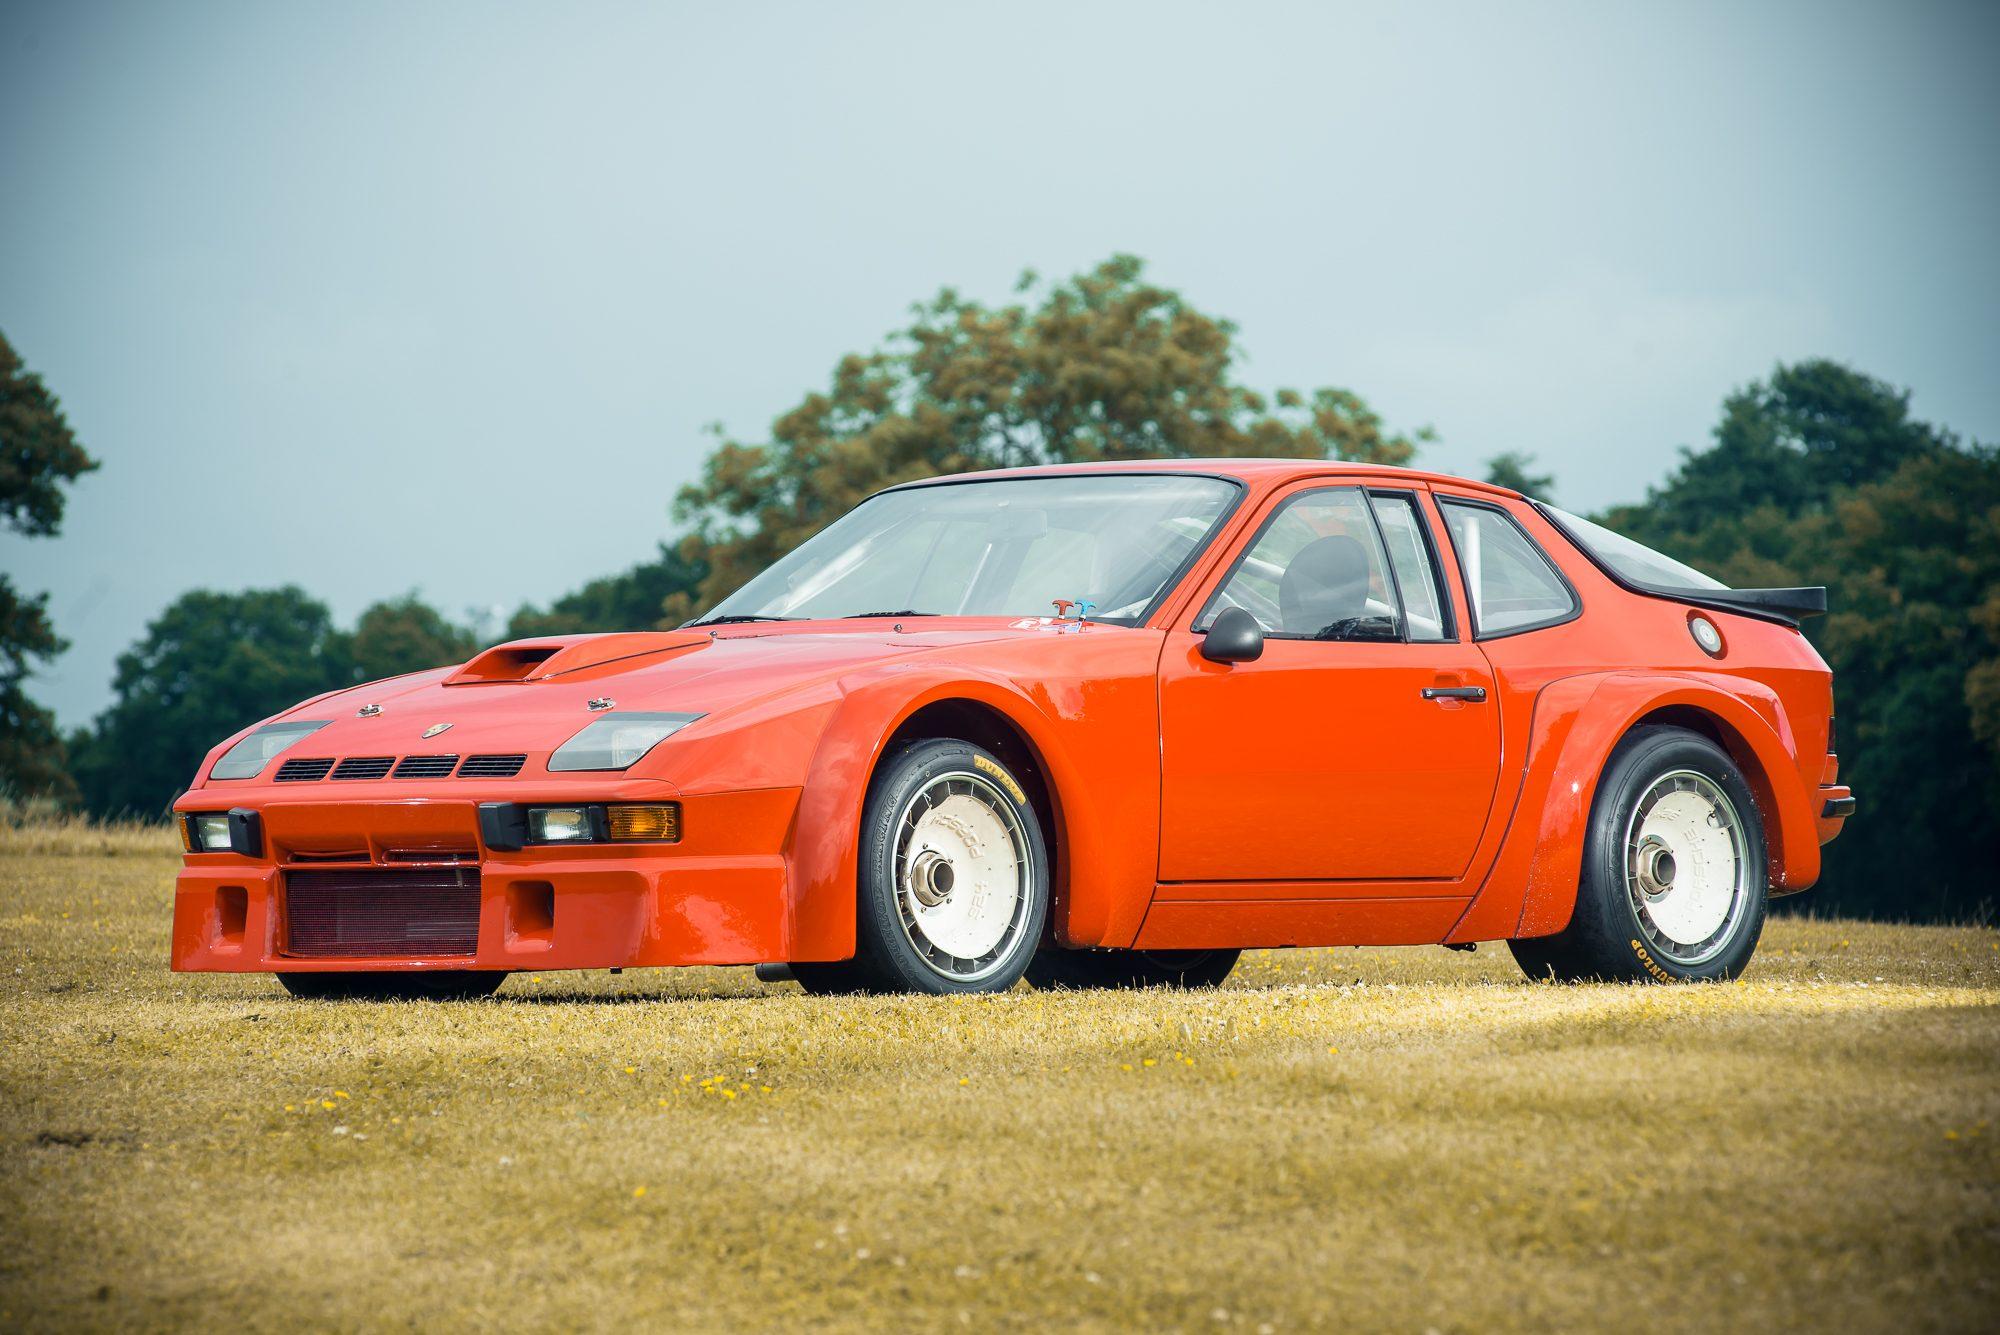 Porsche, Porsche Taycan, 911, 996, 924, 356, 928, 930, GT2, GT2 Turbo, Porsche Turbo, classic Porsche, carandclassic, carandclassic.co.uk, motoring, automotive, classic car, retro car,